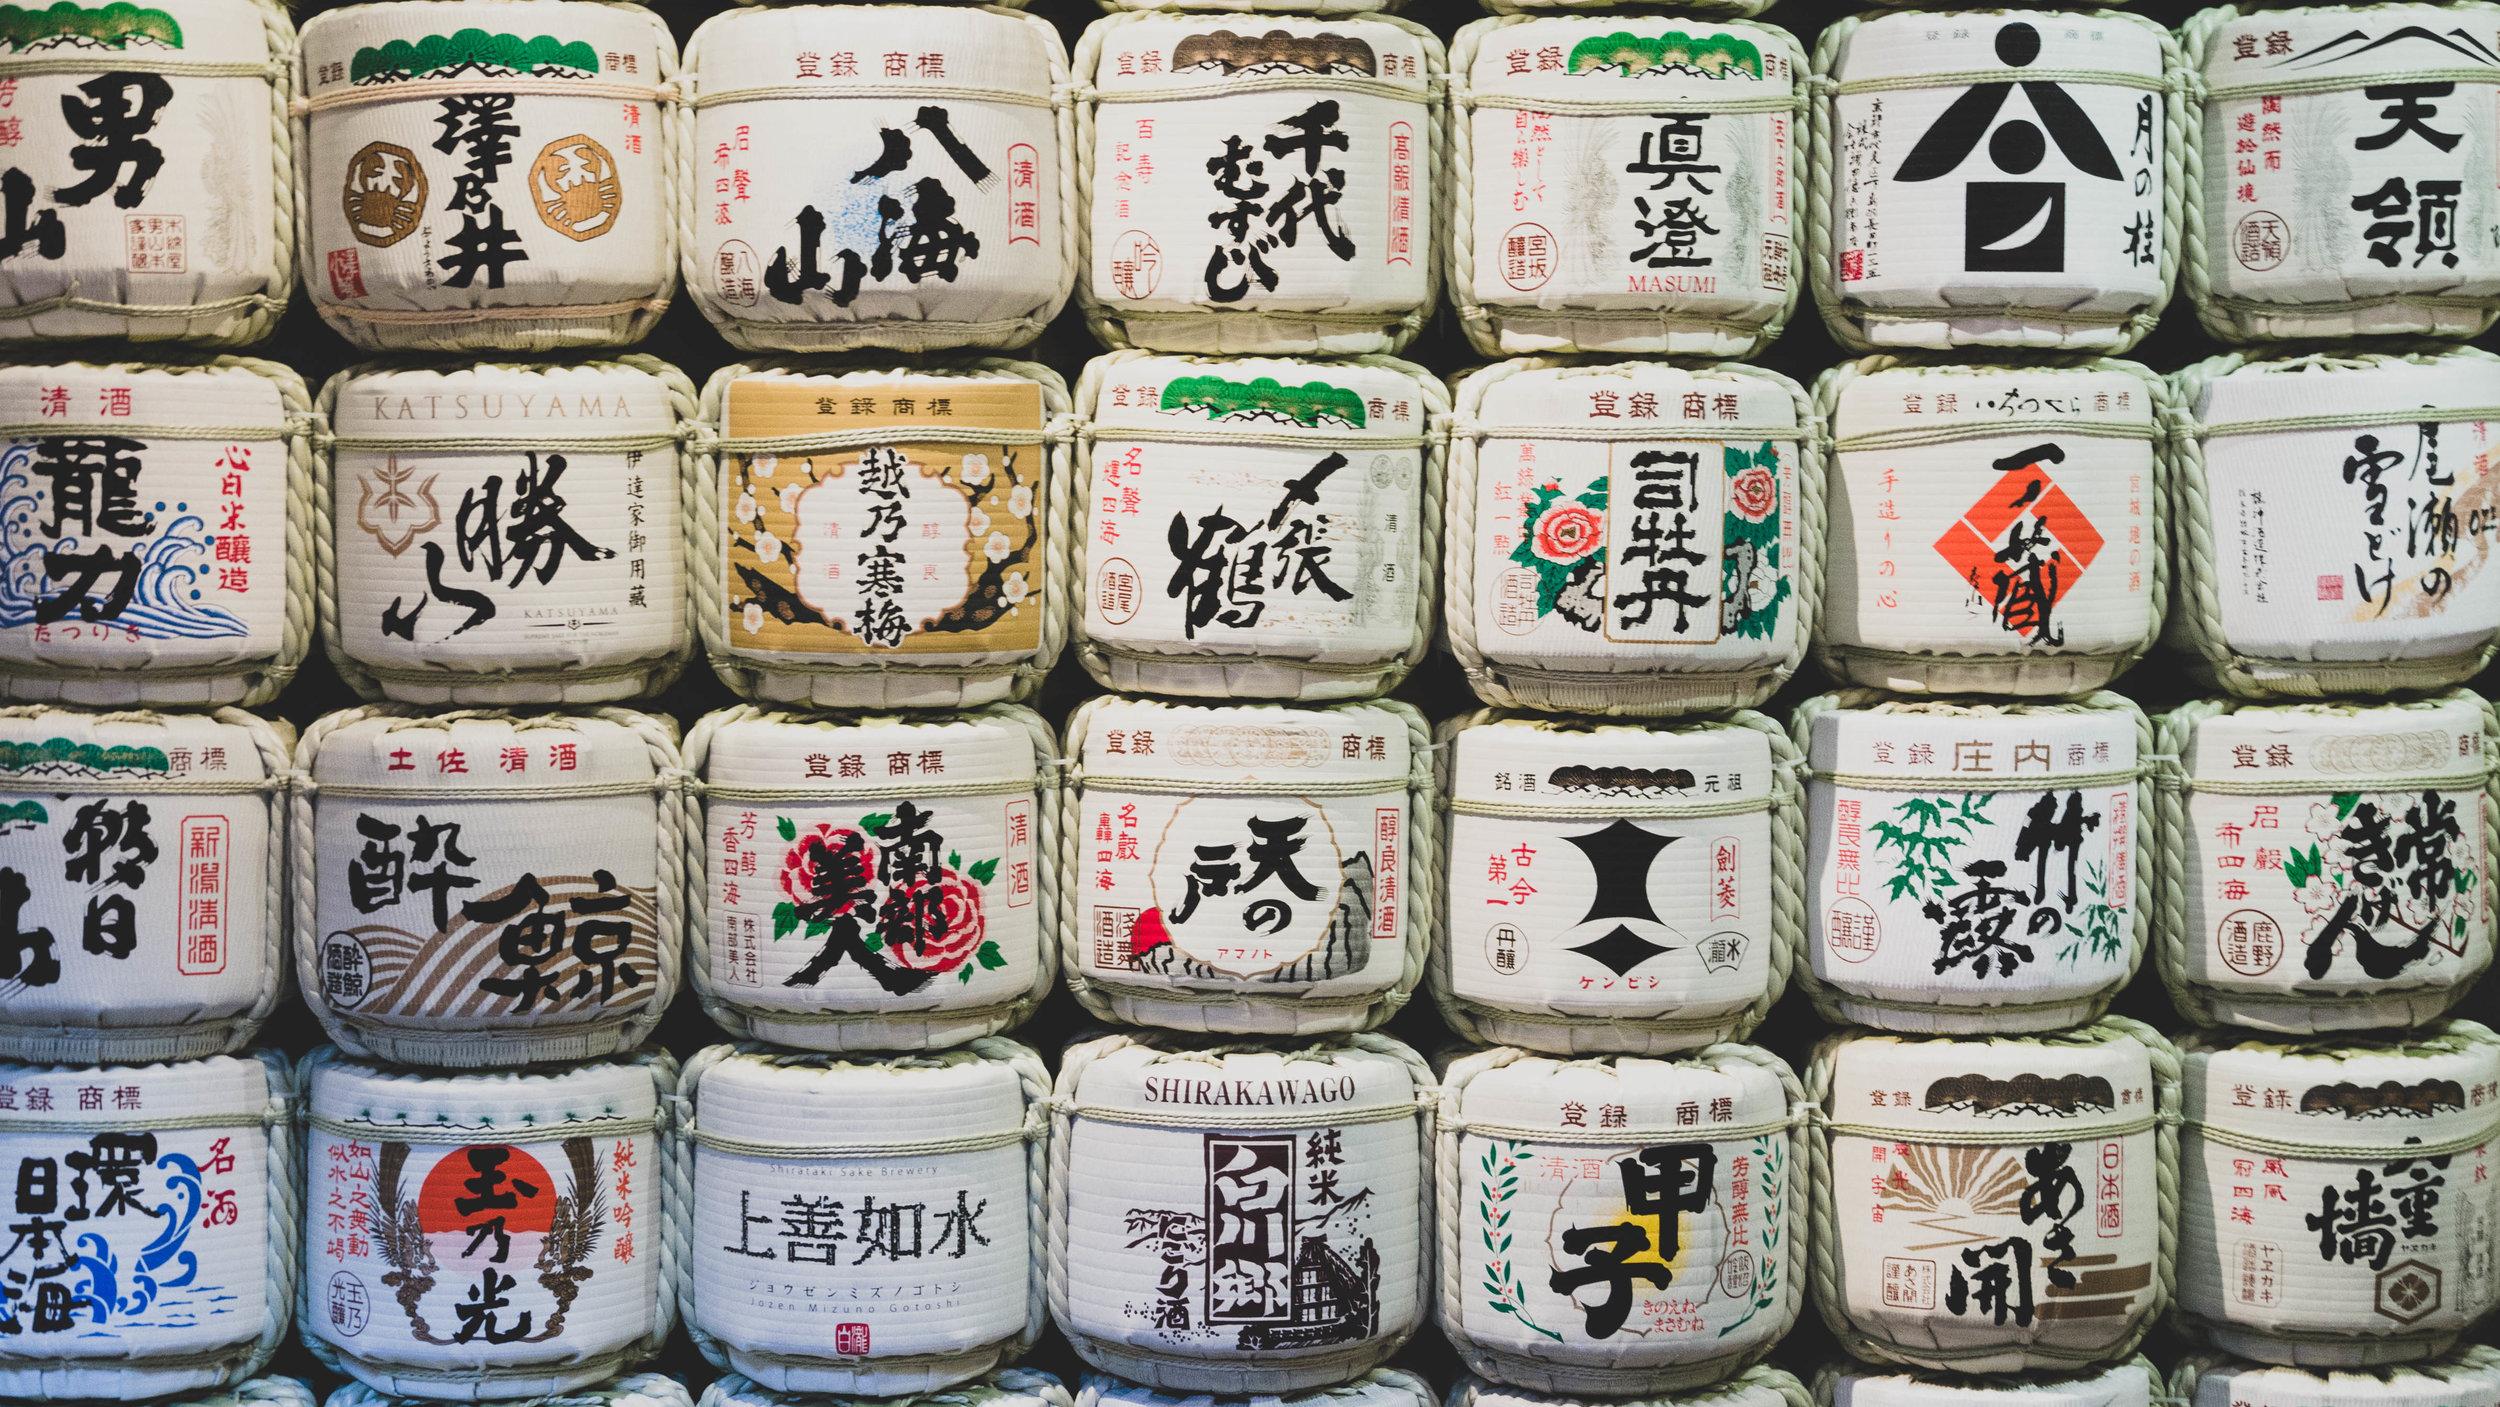 SAKAGURA EAST VILLAGE & SAKE EXPORT ASSOCIATION PRESENTS -